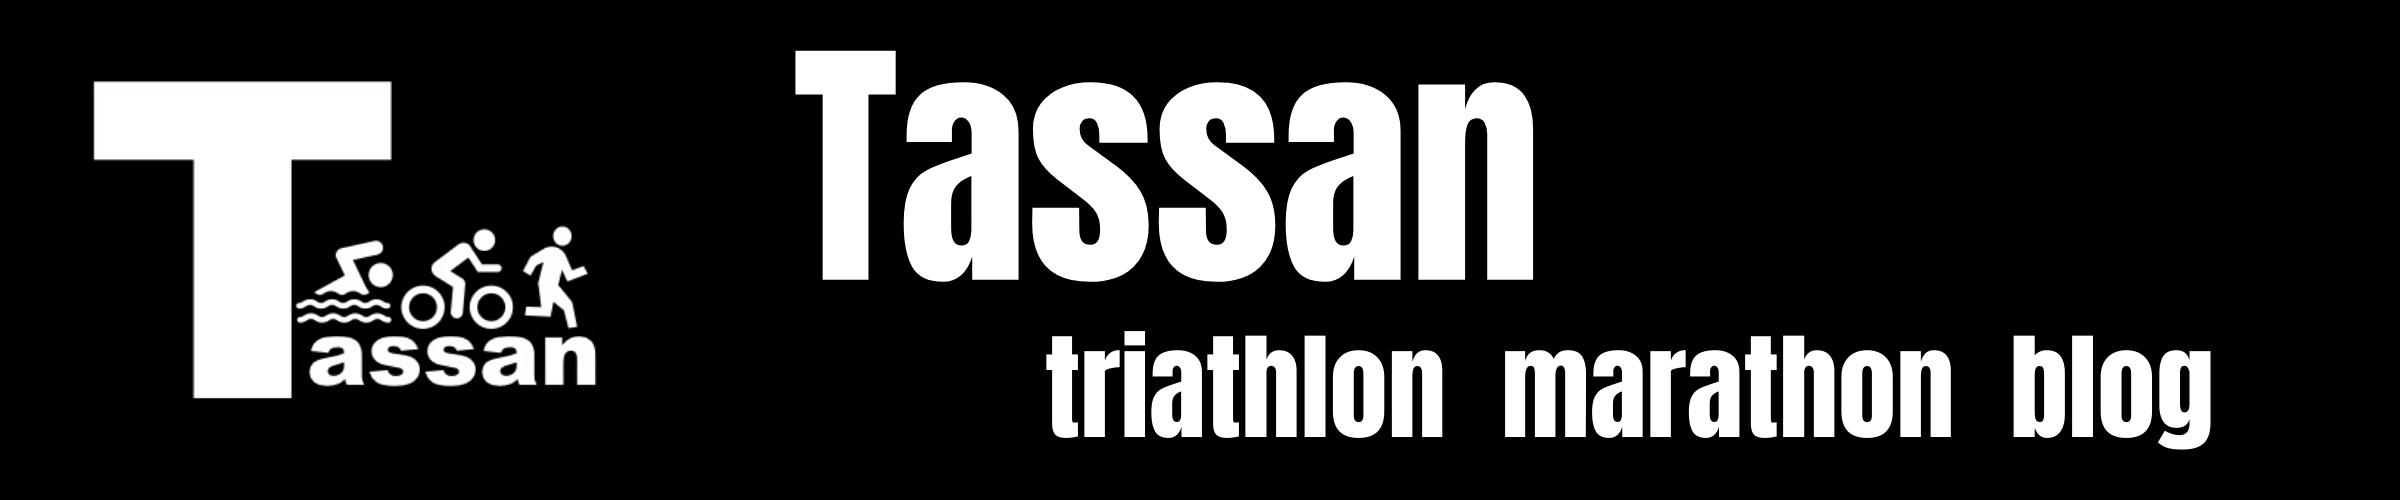 Tassanのトライアスロンマラソンブログ